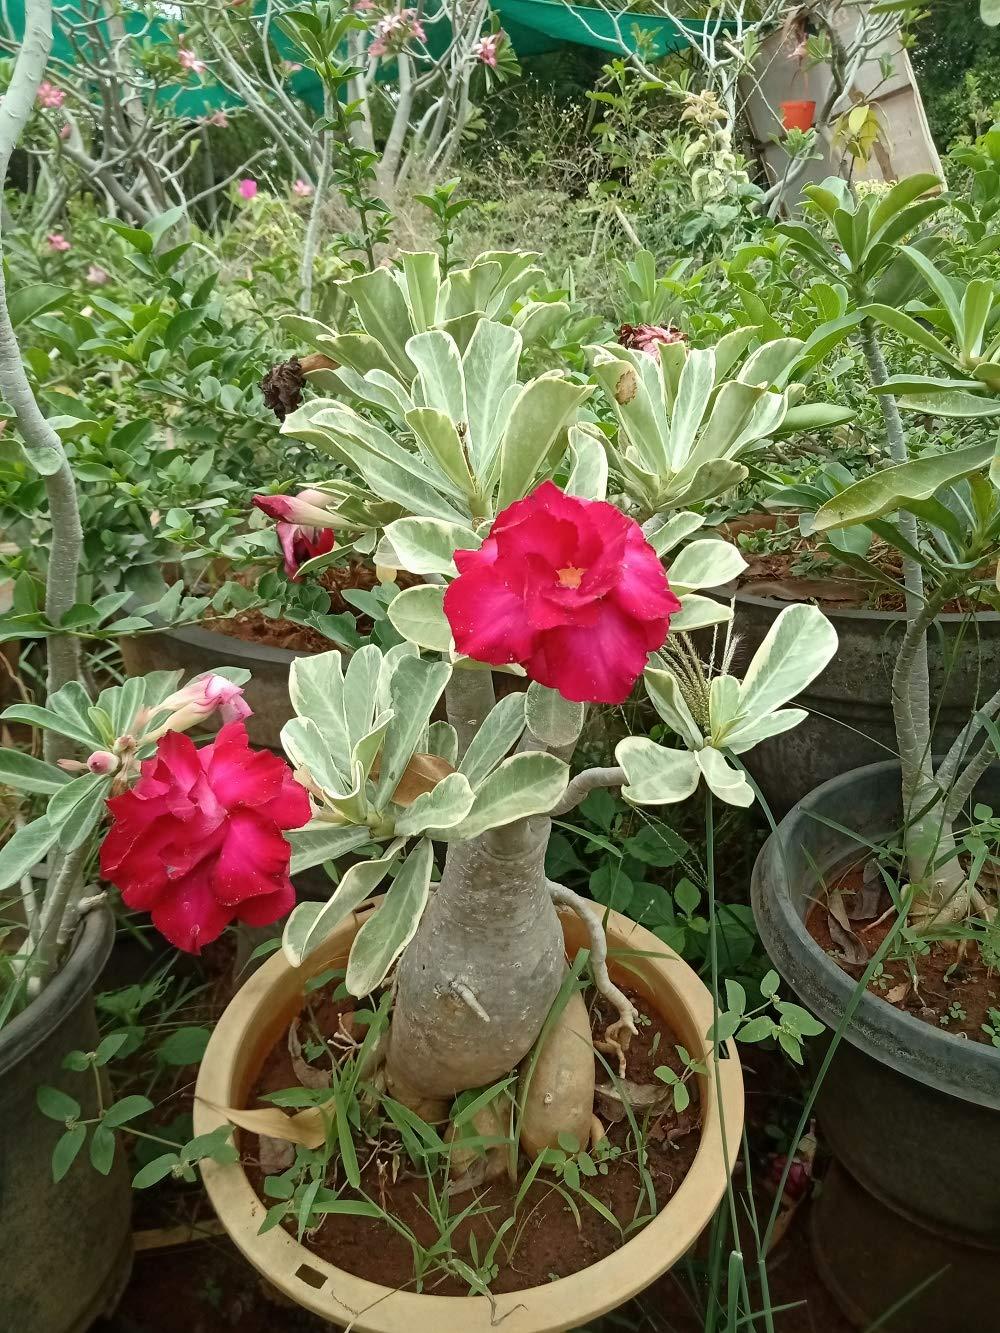 Zooqa Farm Bonsai Adenium Plant Amazon In Garden Outdoors